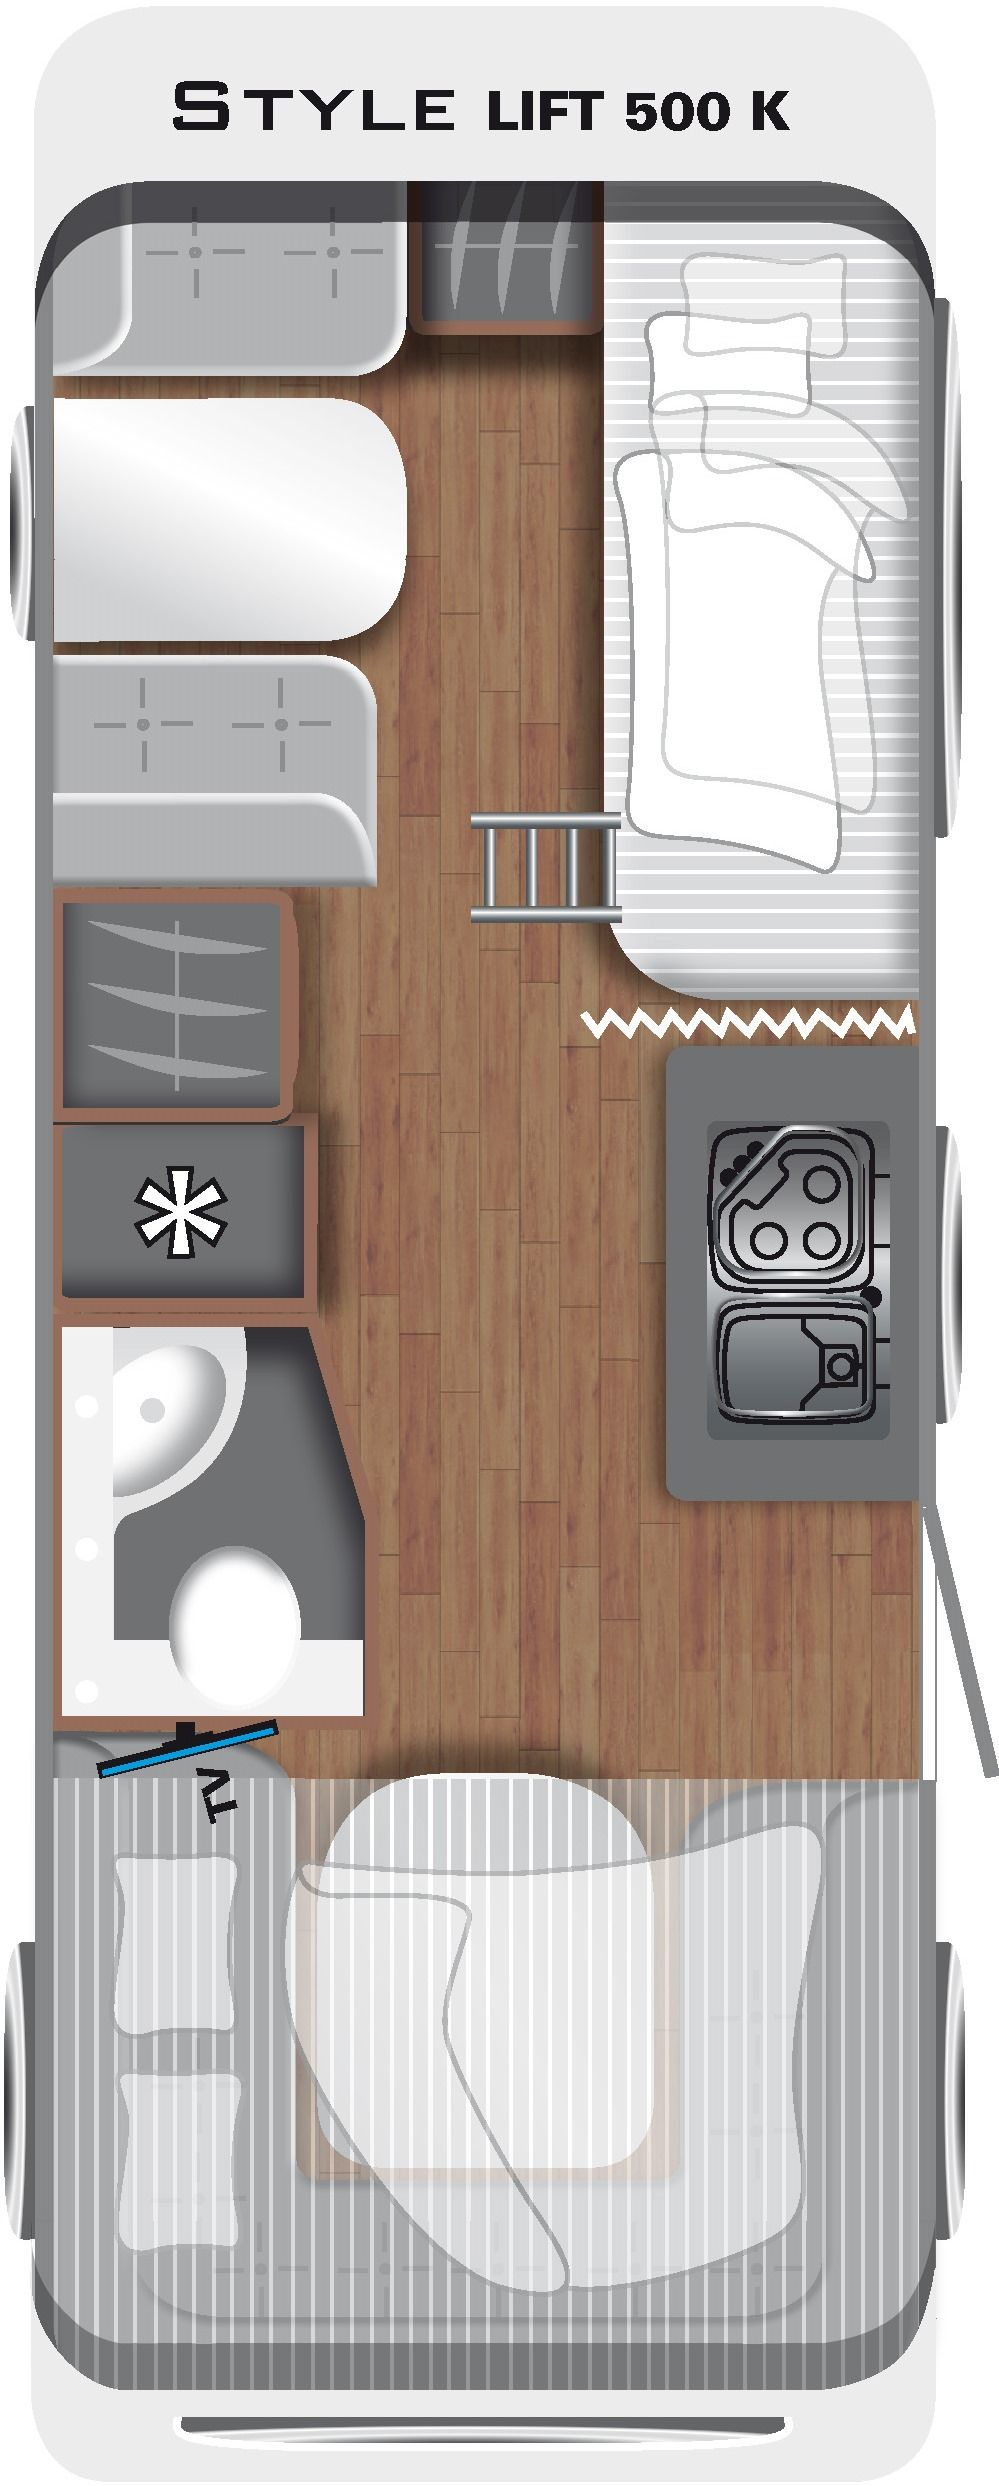 Style Lift 500 K